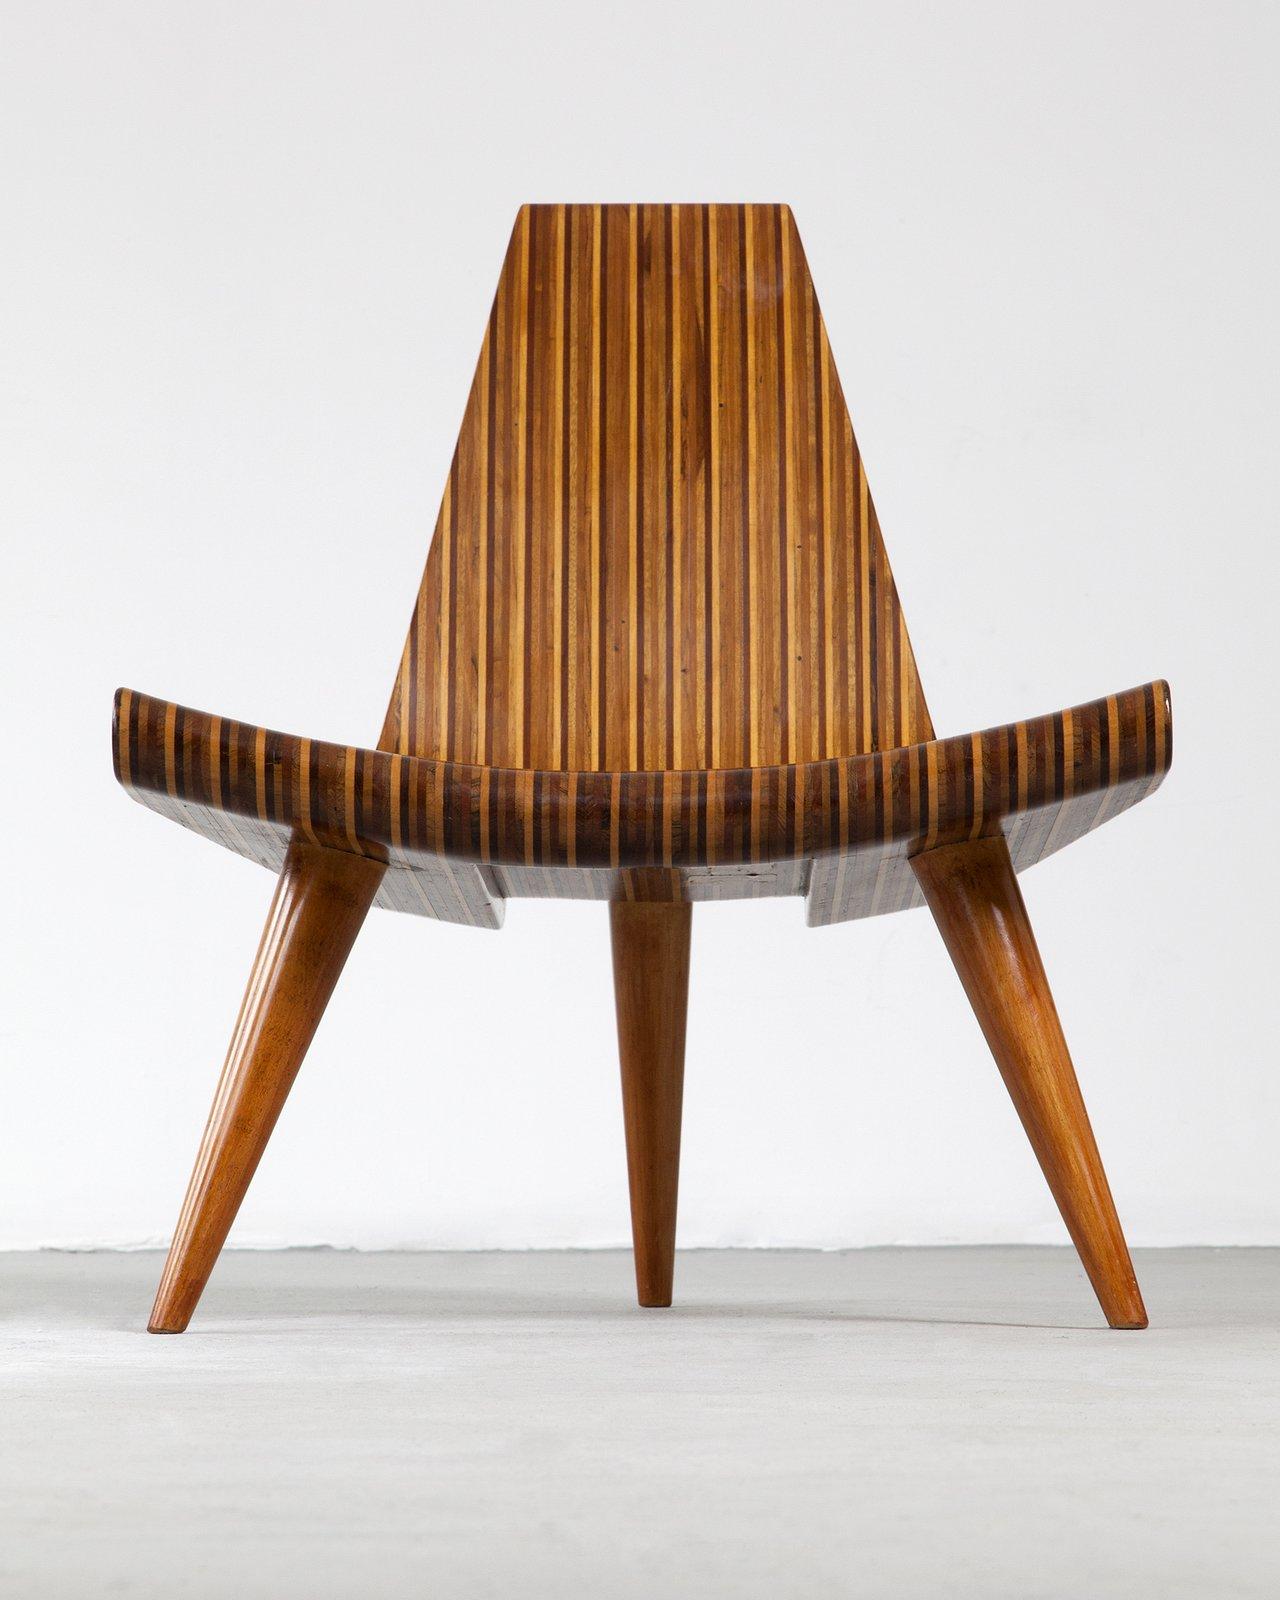 #seatingdesign #chair #JoaquimTenreiro #Brazil #hardwood #furniture #modern #modernism  100+ Best Modern Seating Designs by Dwell